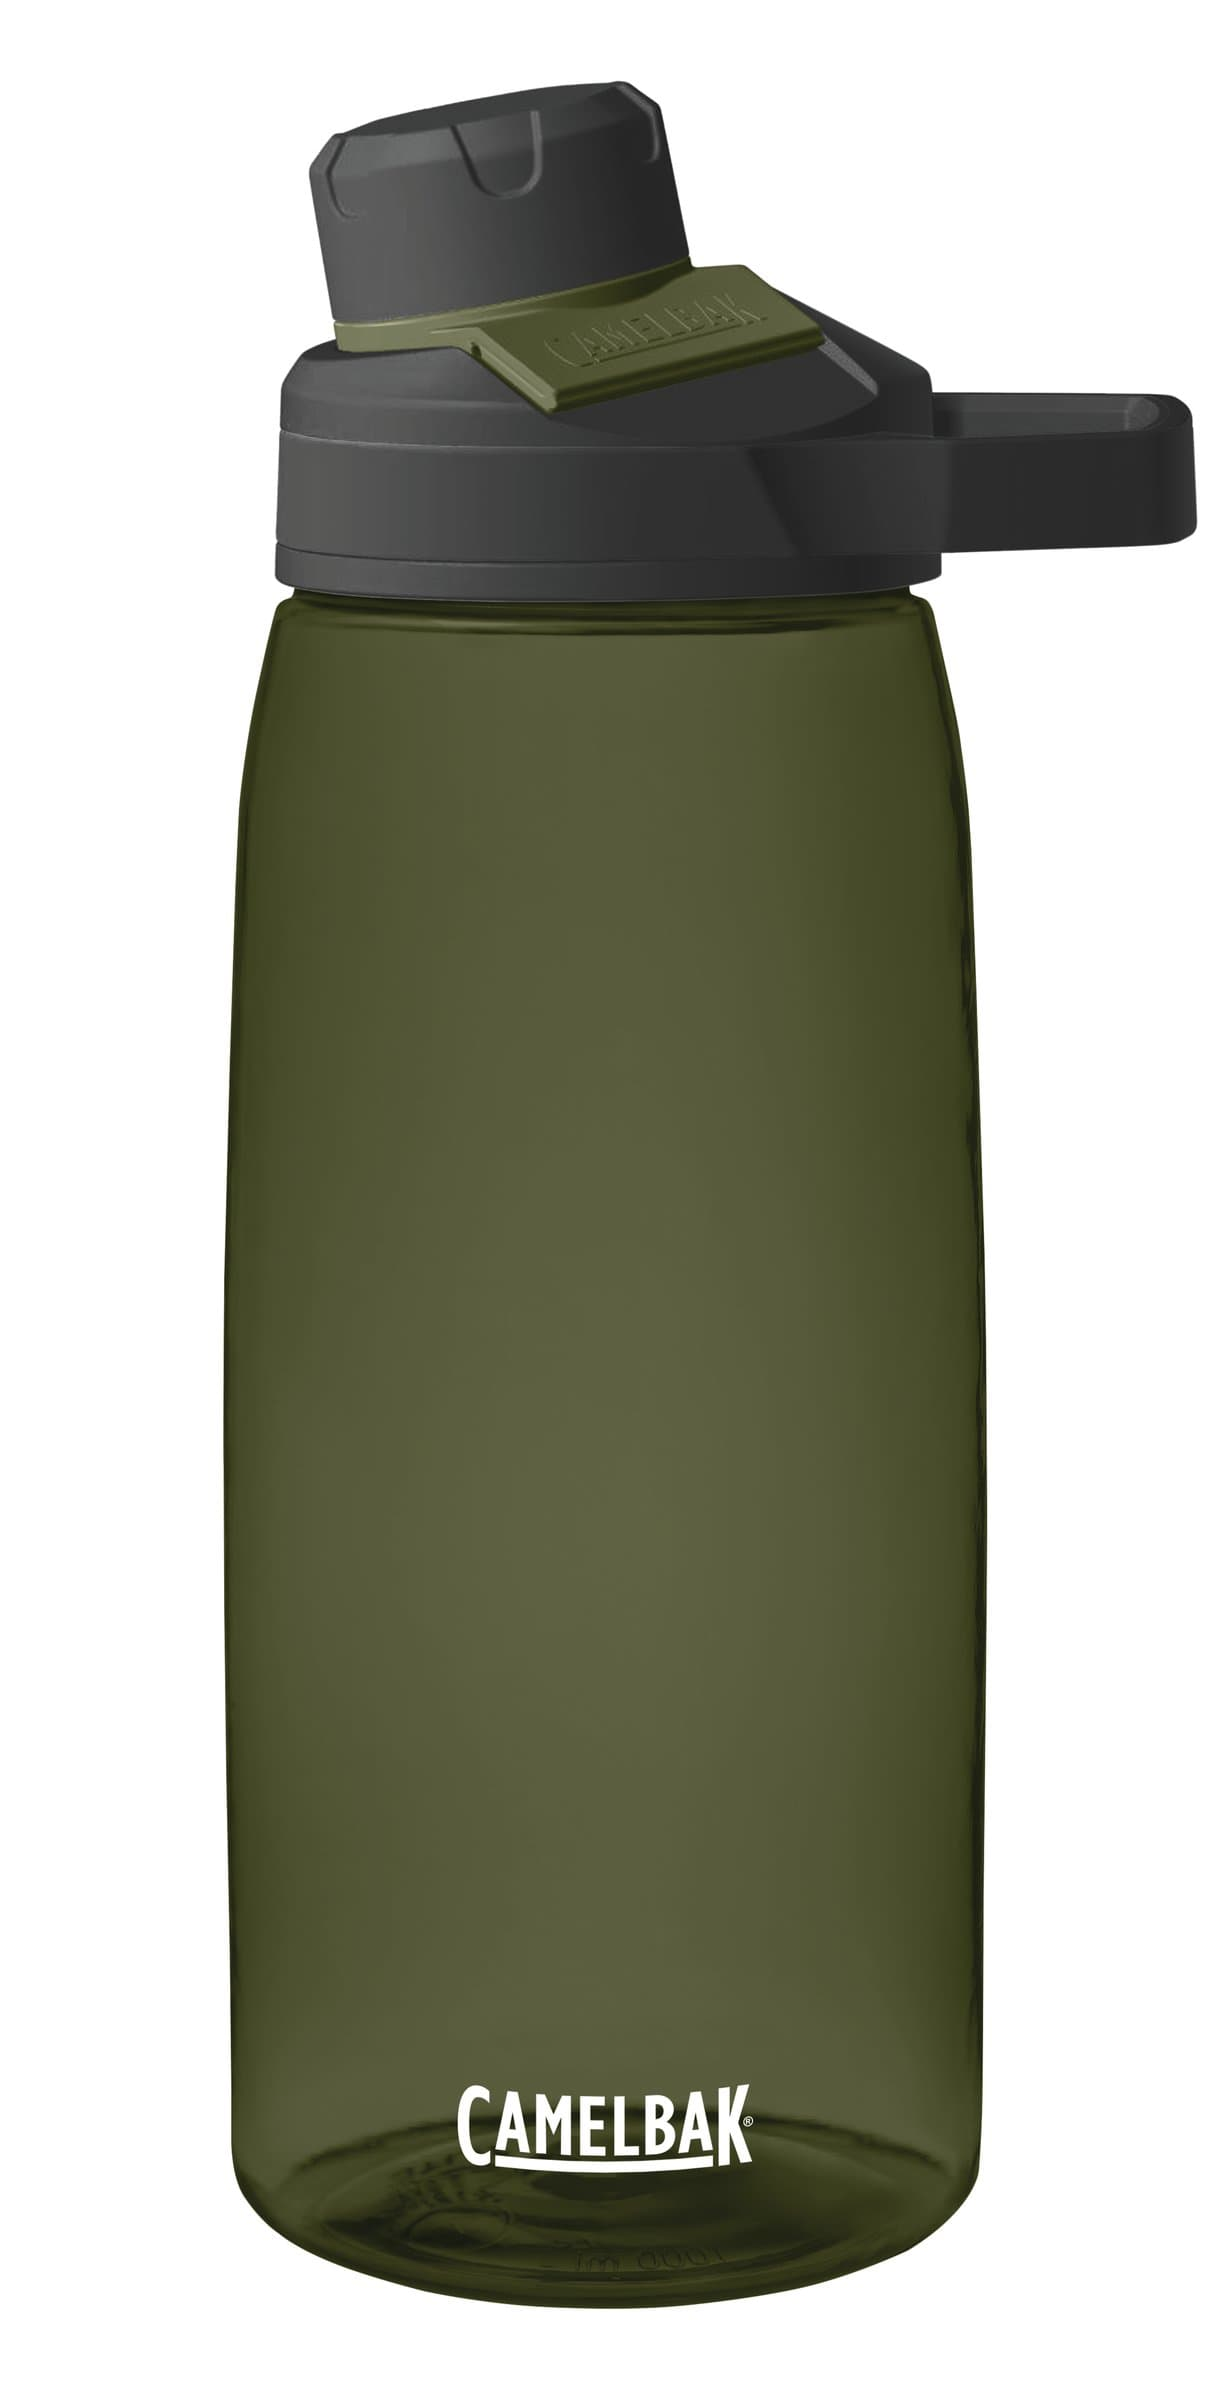 Camelbak Chute Mag Bottle 1.0 Trinkflasche